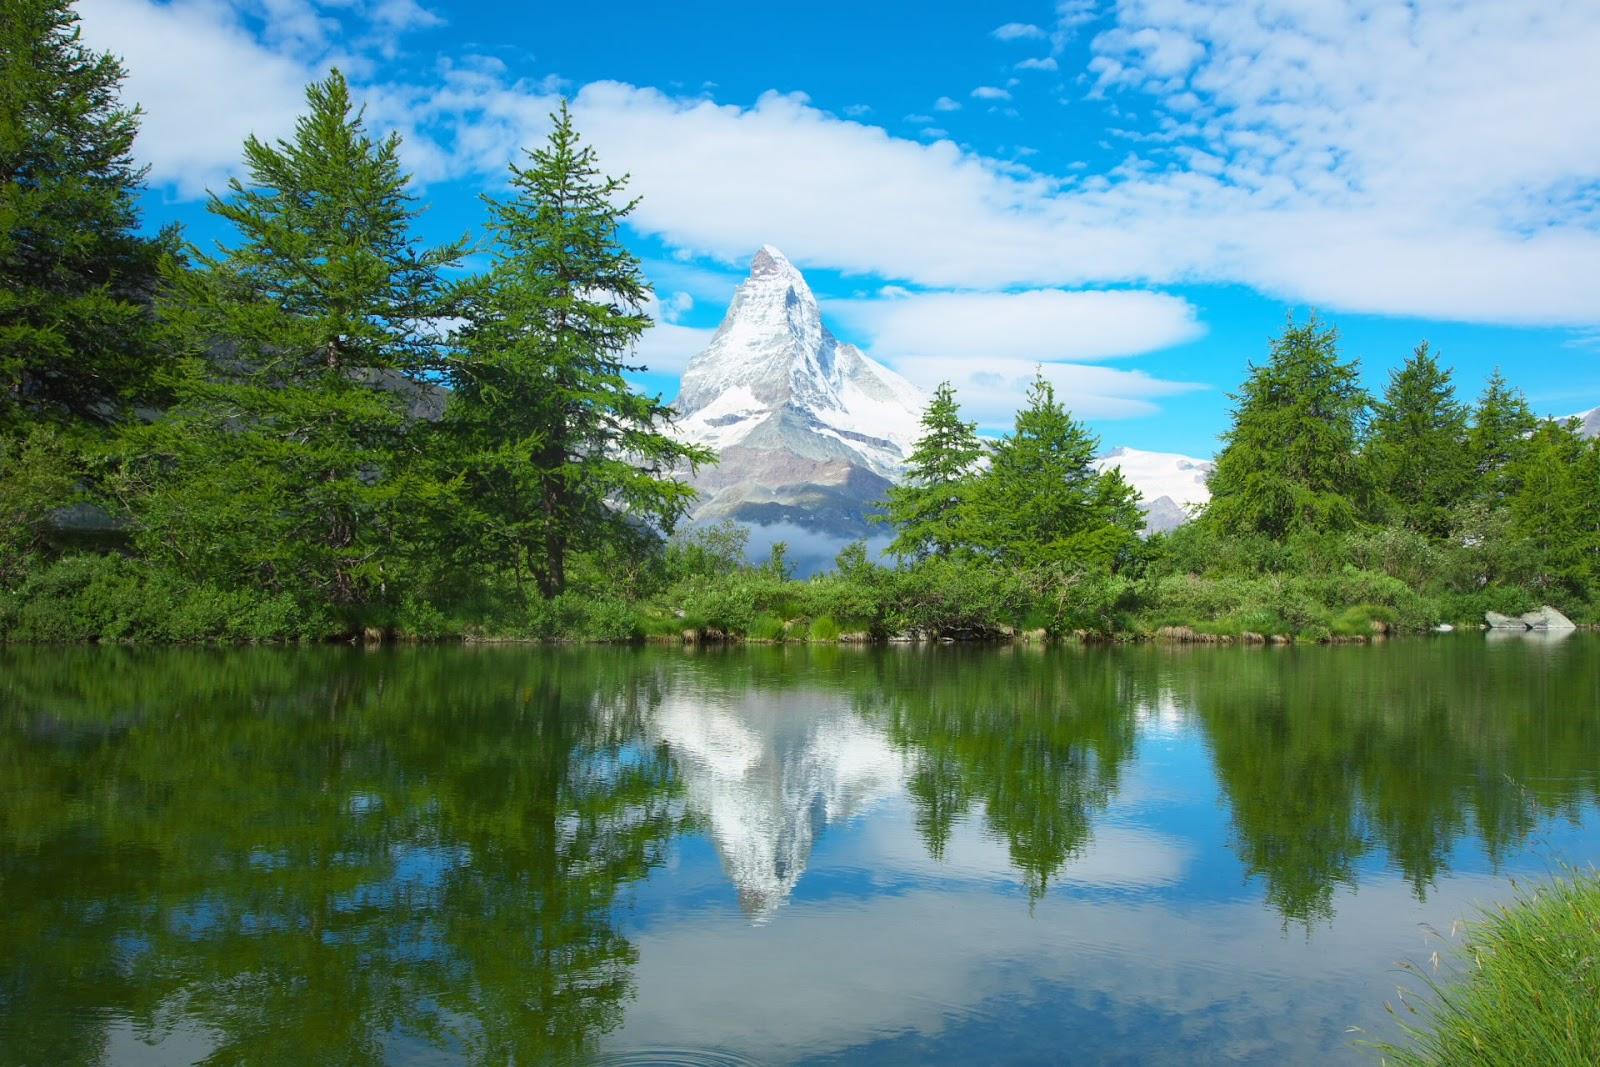 Imagenes De Fondo De Paisajes - Descargar imagenes fondo paisajes para Android Softonic